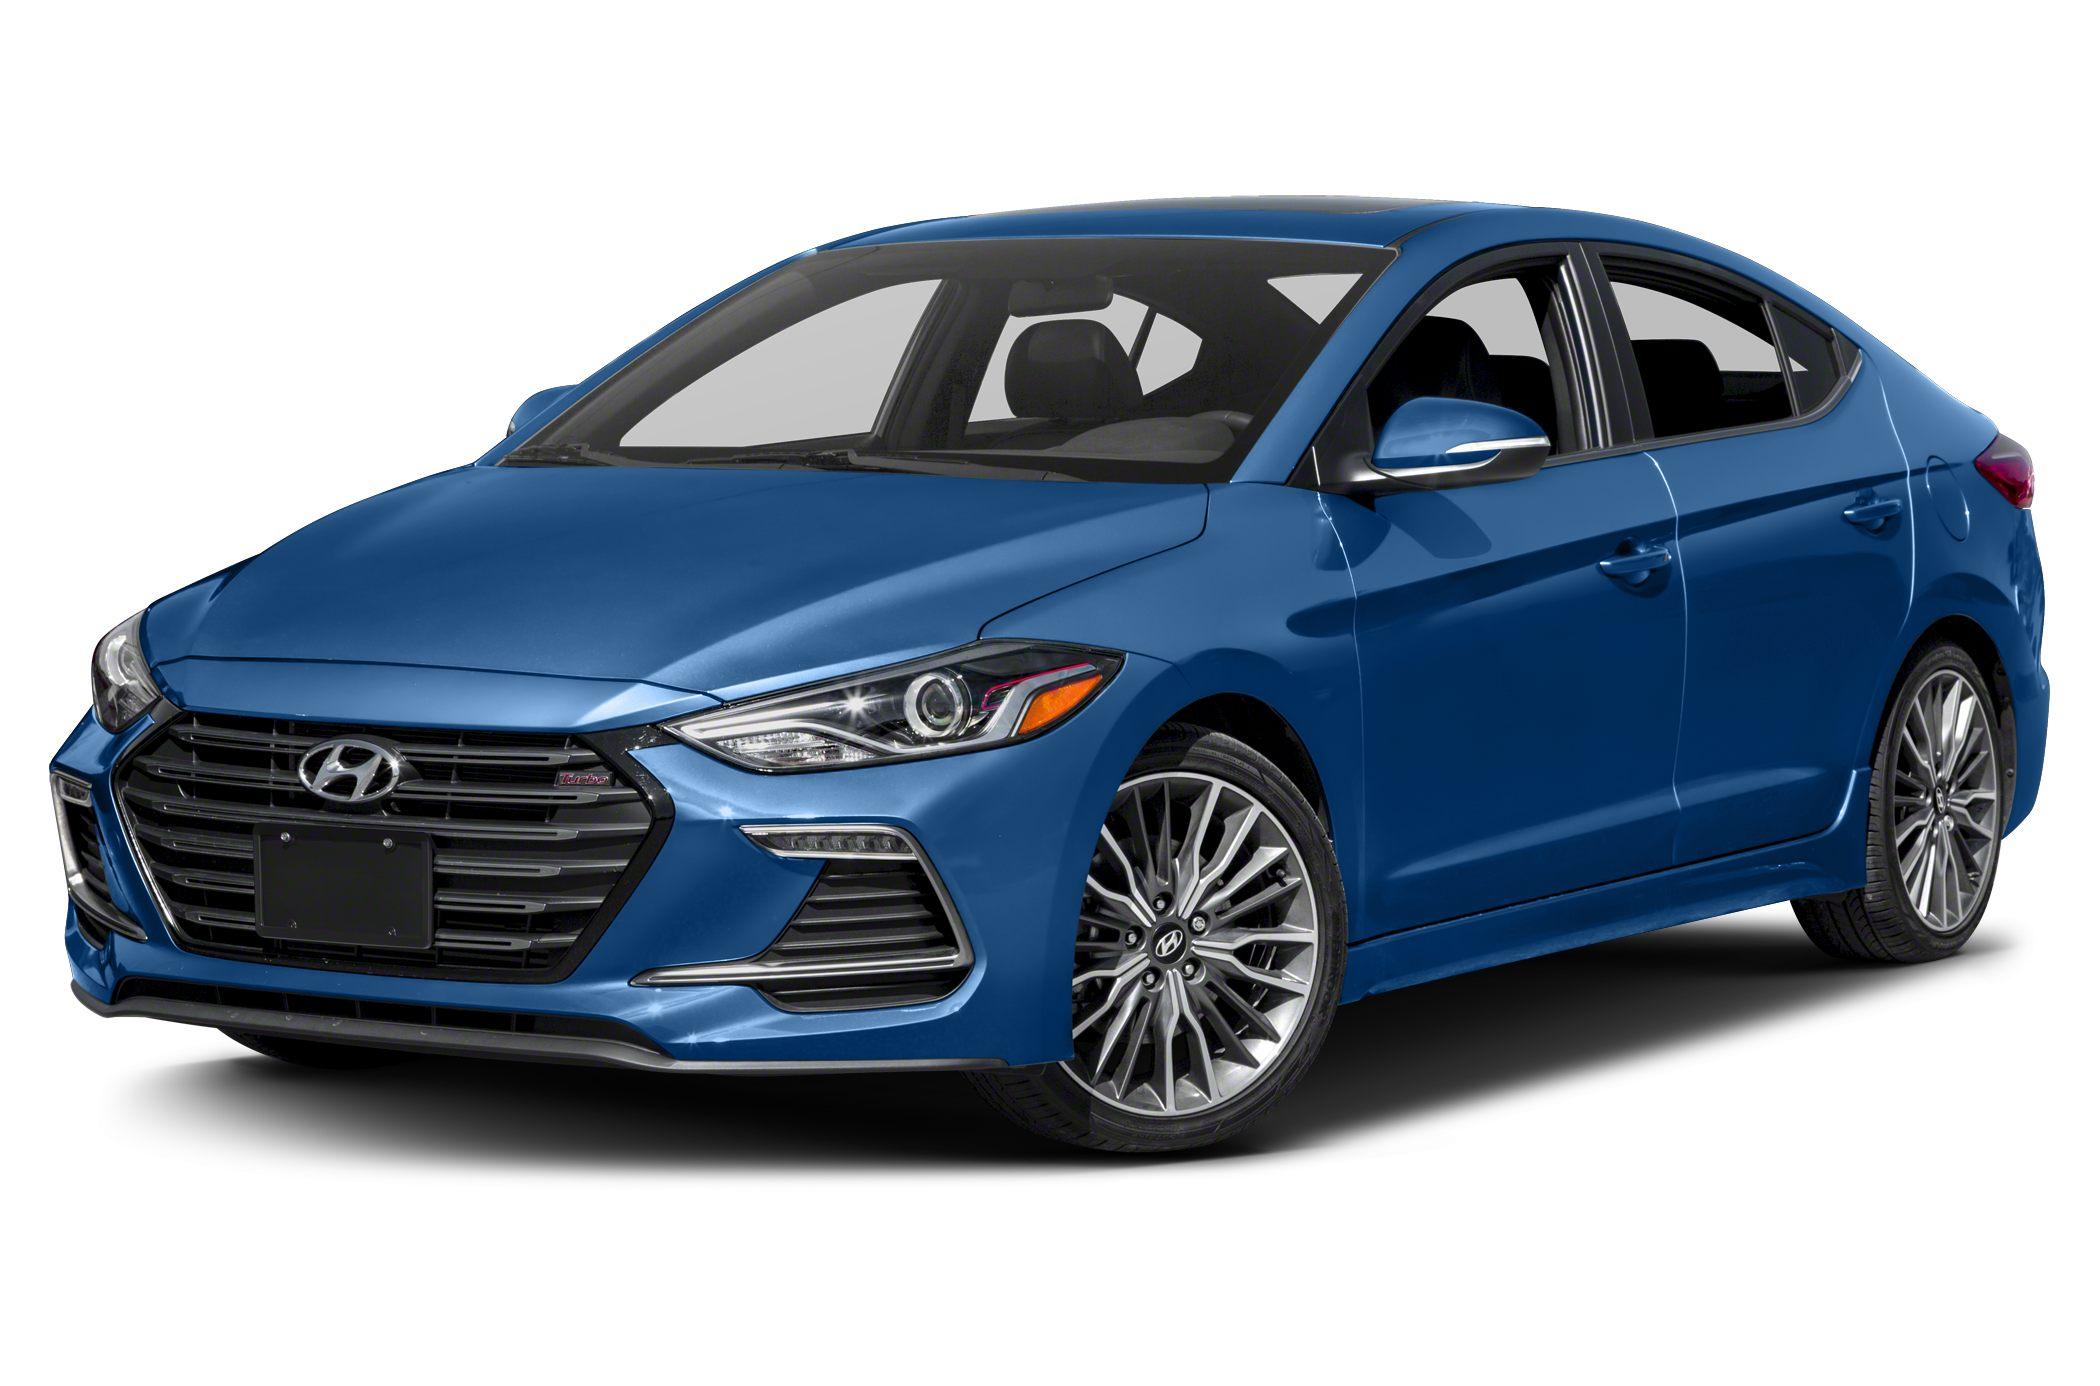 2017 Hyundai Elantra Sport Price includes 500 - HMF Bonus APR Cash - Standard - East Exp 0403